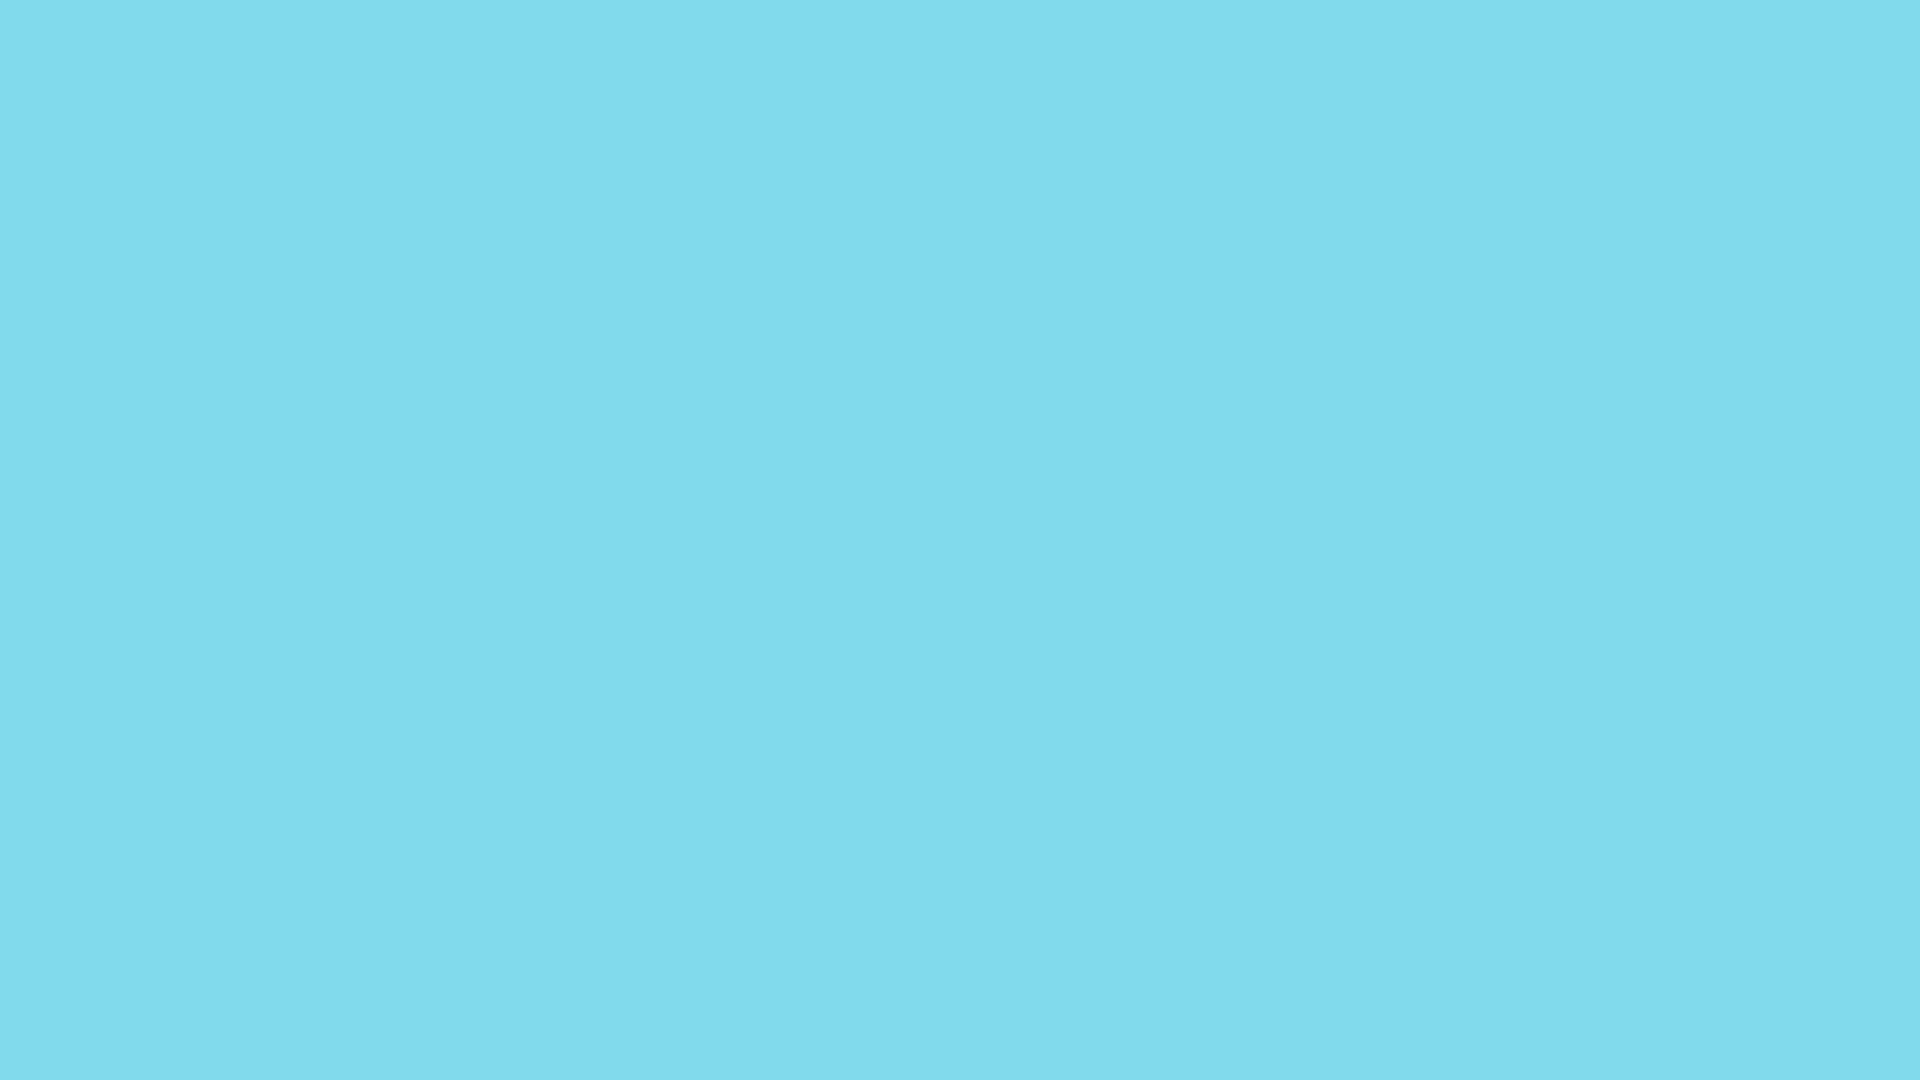 1920x1080 Medium Sky Blue Solid Color Background